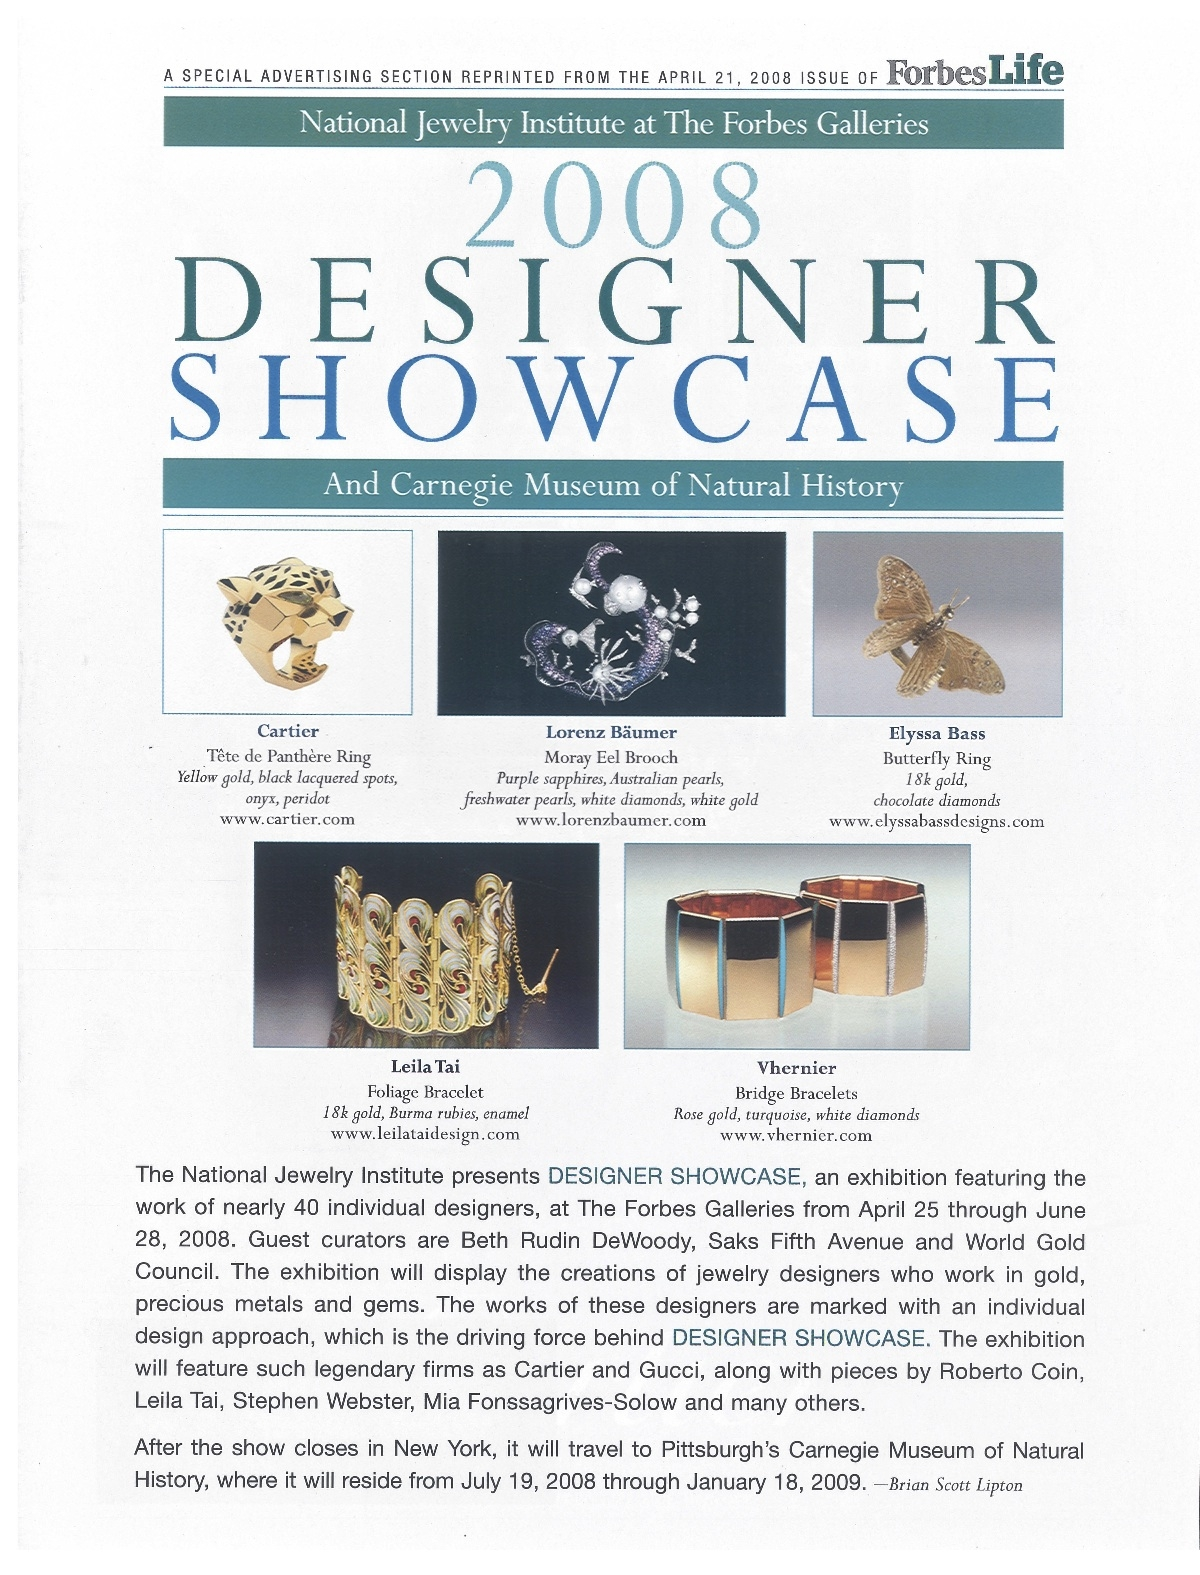 NIJI Forbes Gallery Designer Showcase 2008